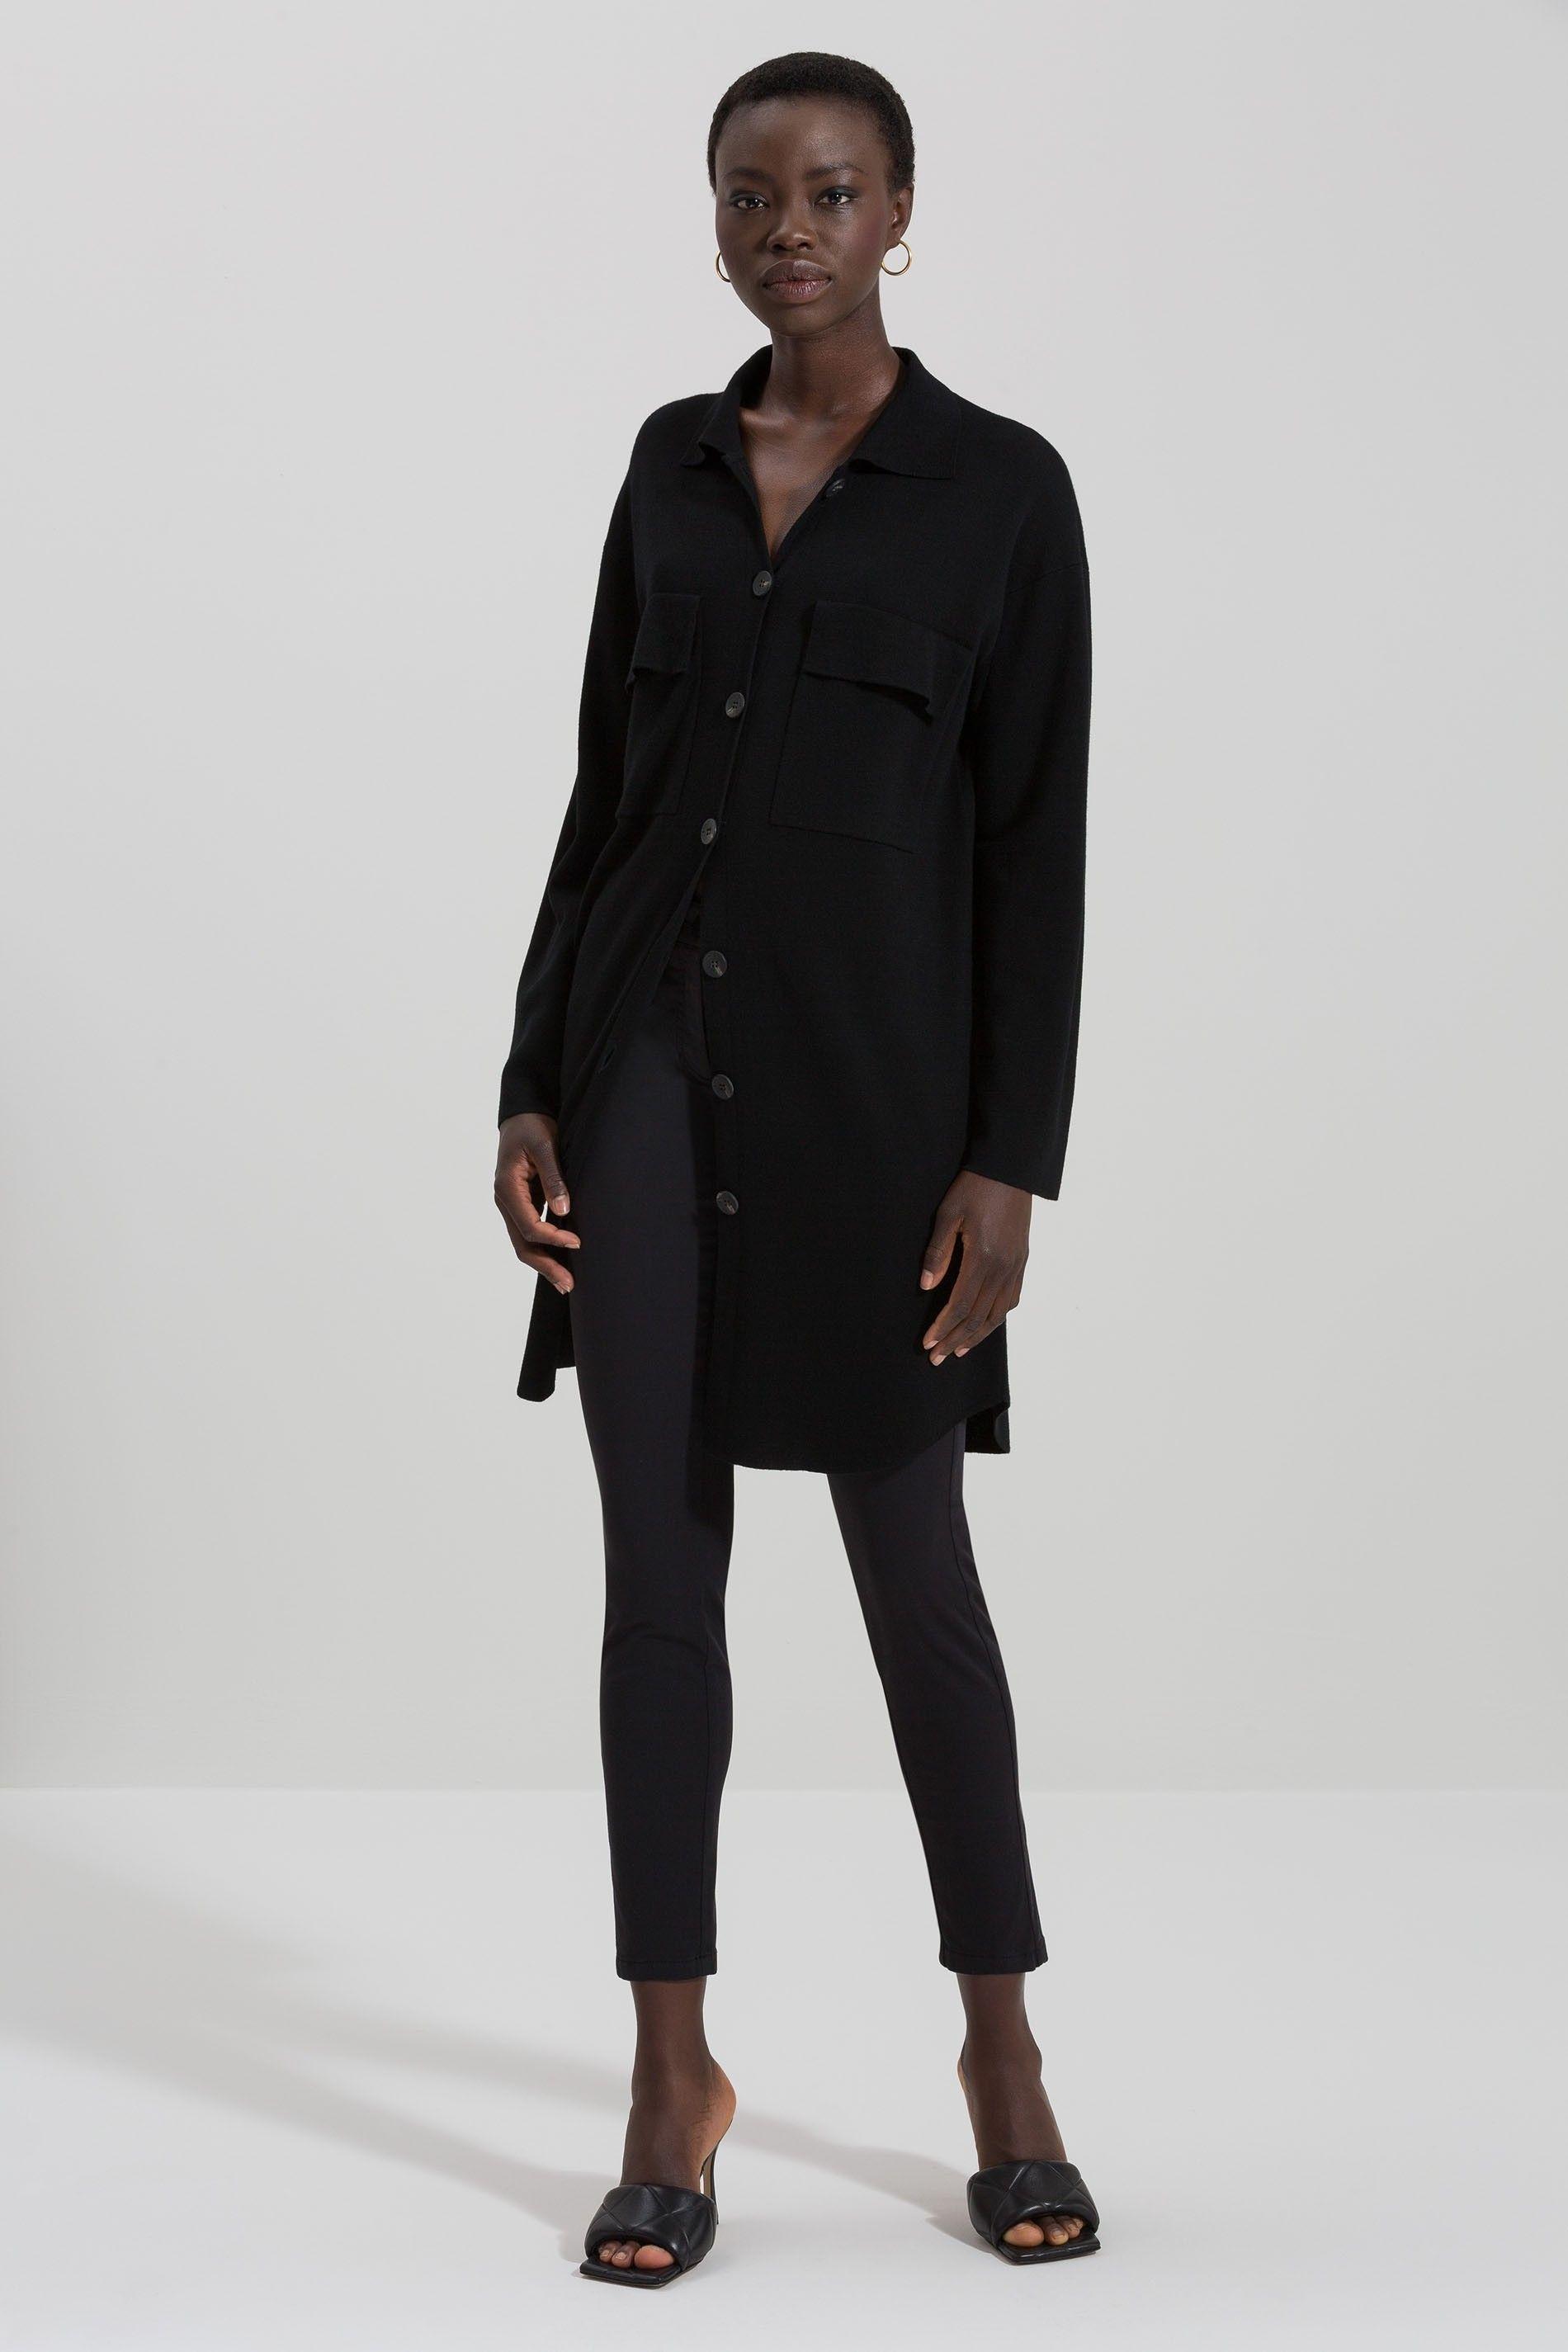 LUISA CERANO - Damen Overshirt - aus Wolle - Black